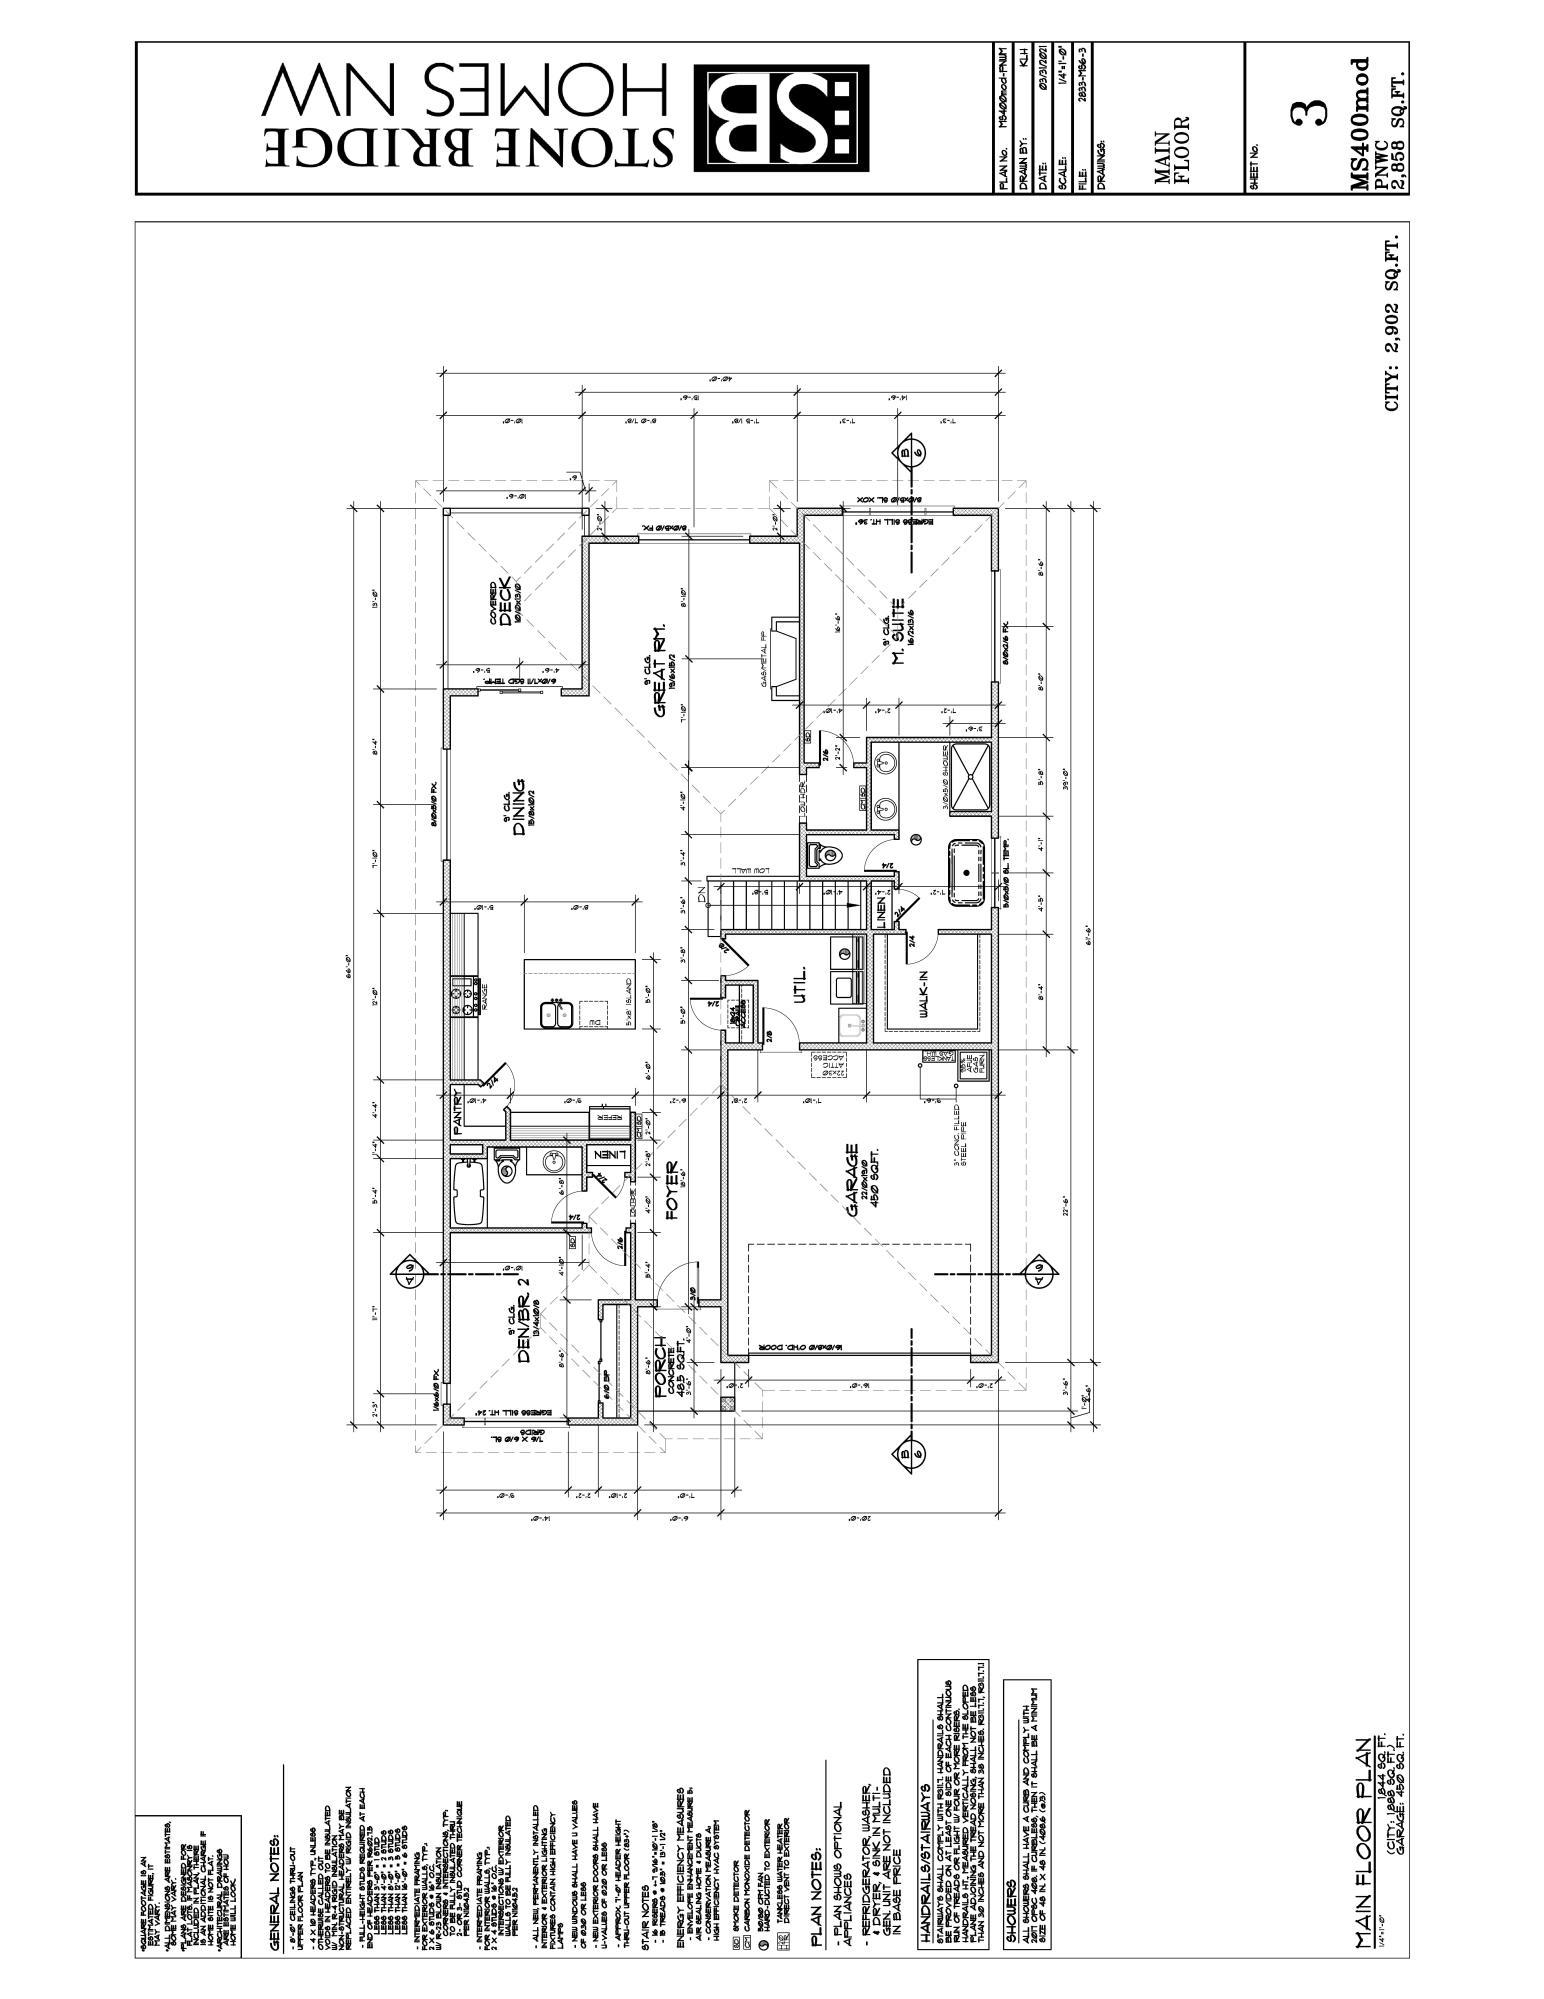 A1.3-MAIN FLOOR PLAN MS6